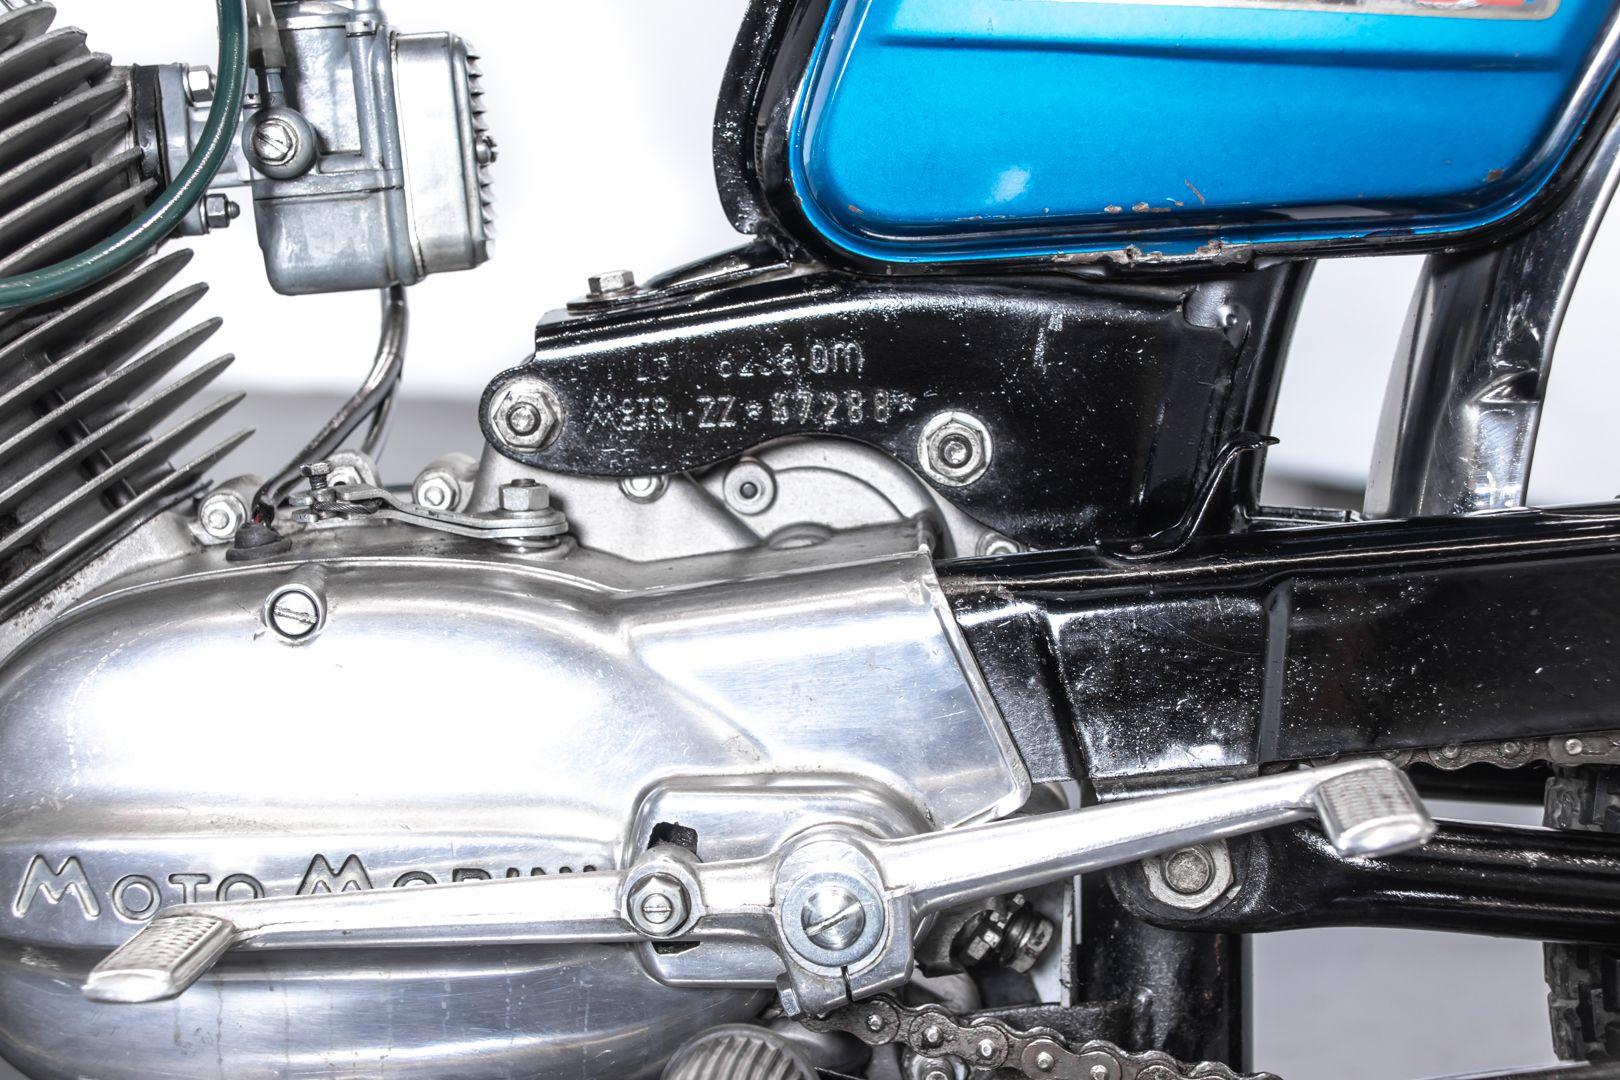 1975 Moto Morini Corsarino ZZ 77781